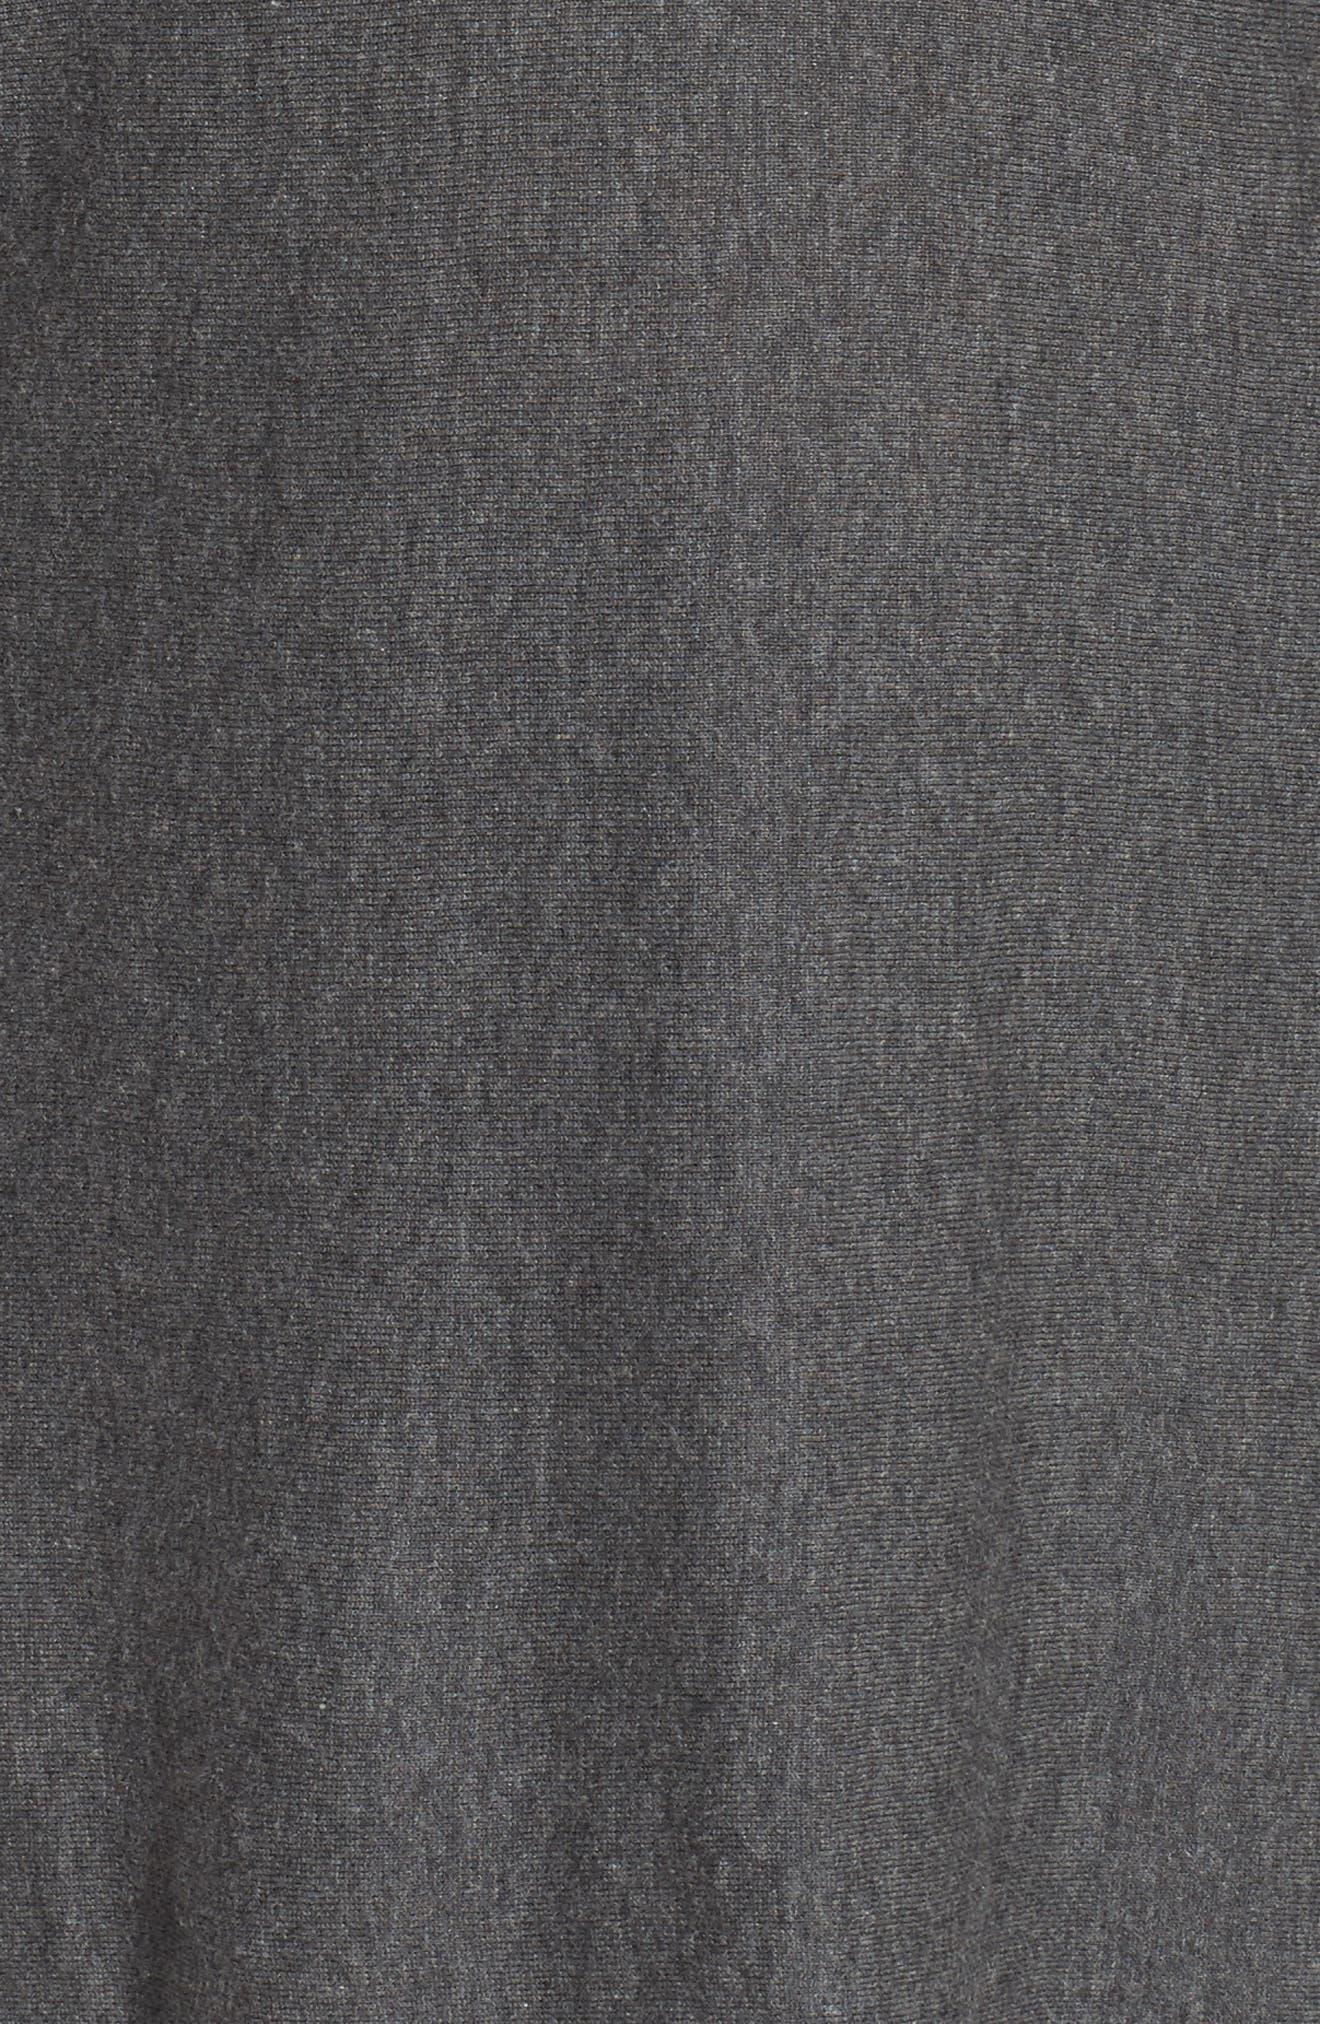 Alternate Image 5  - Vince Camuto Turtleneck Sweater (Plus Size)